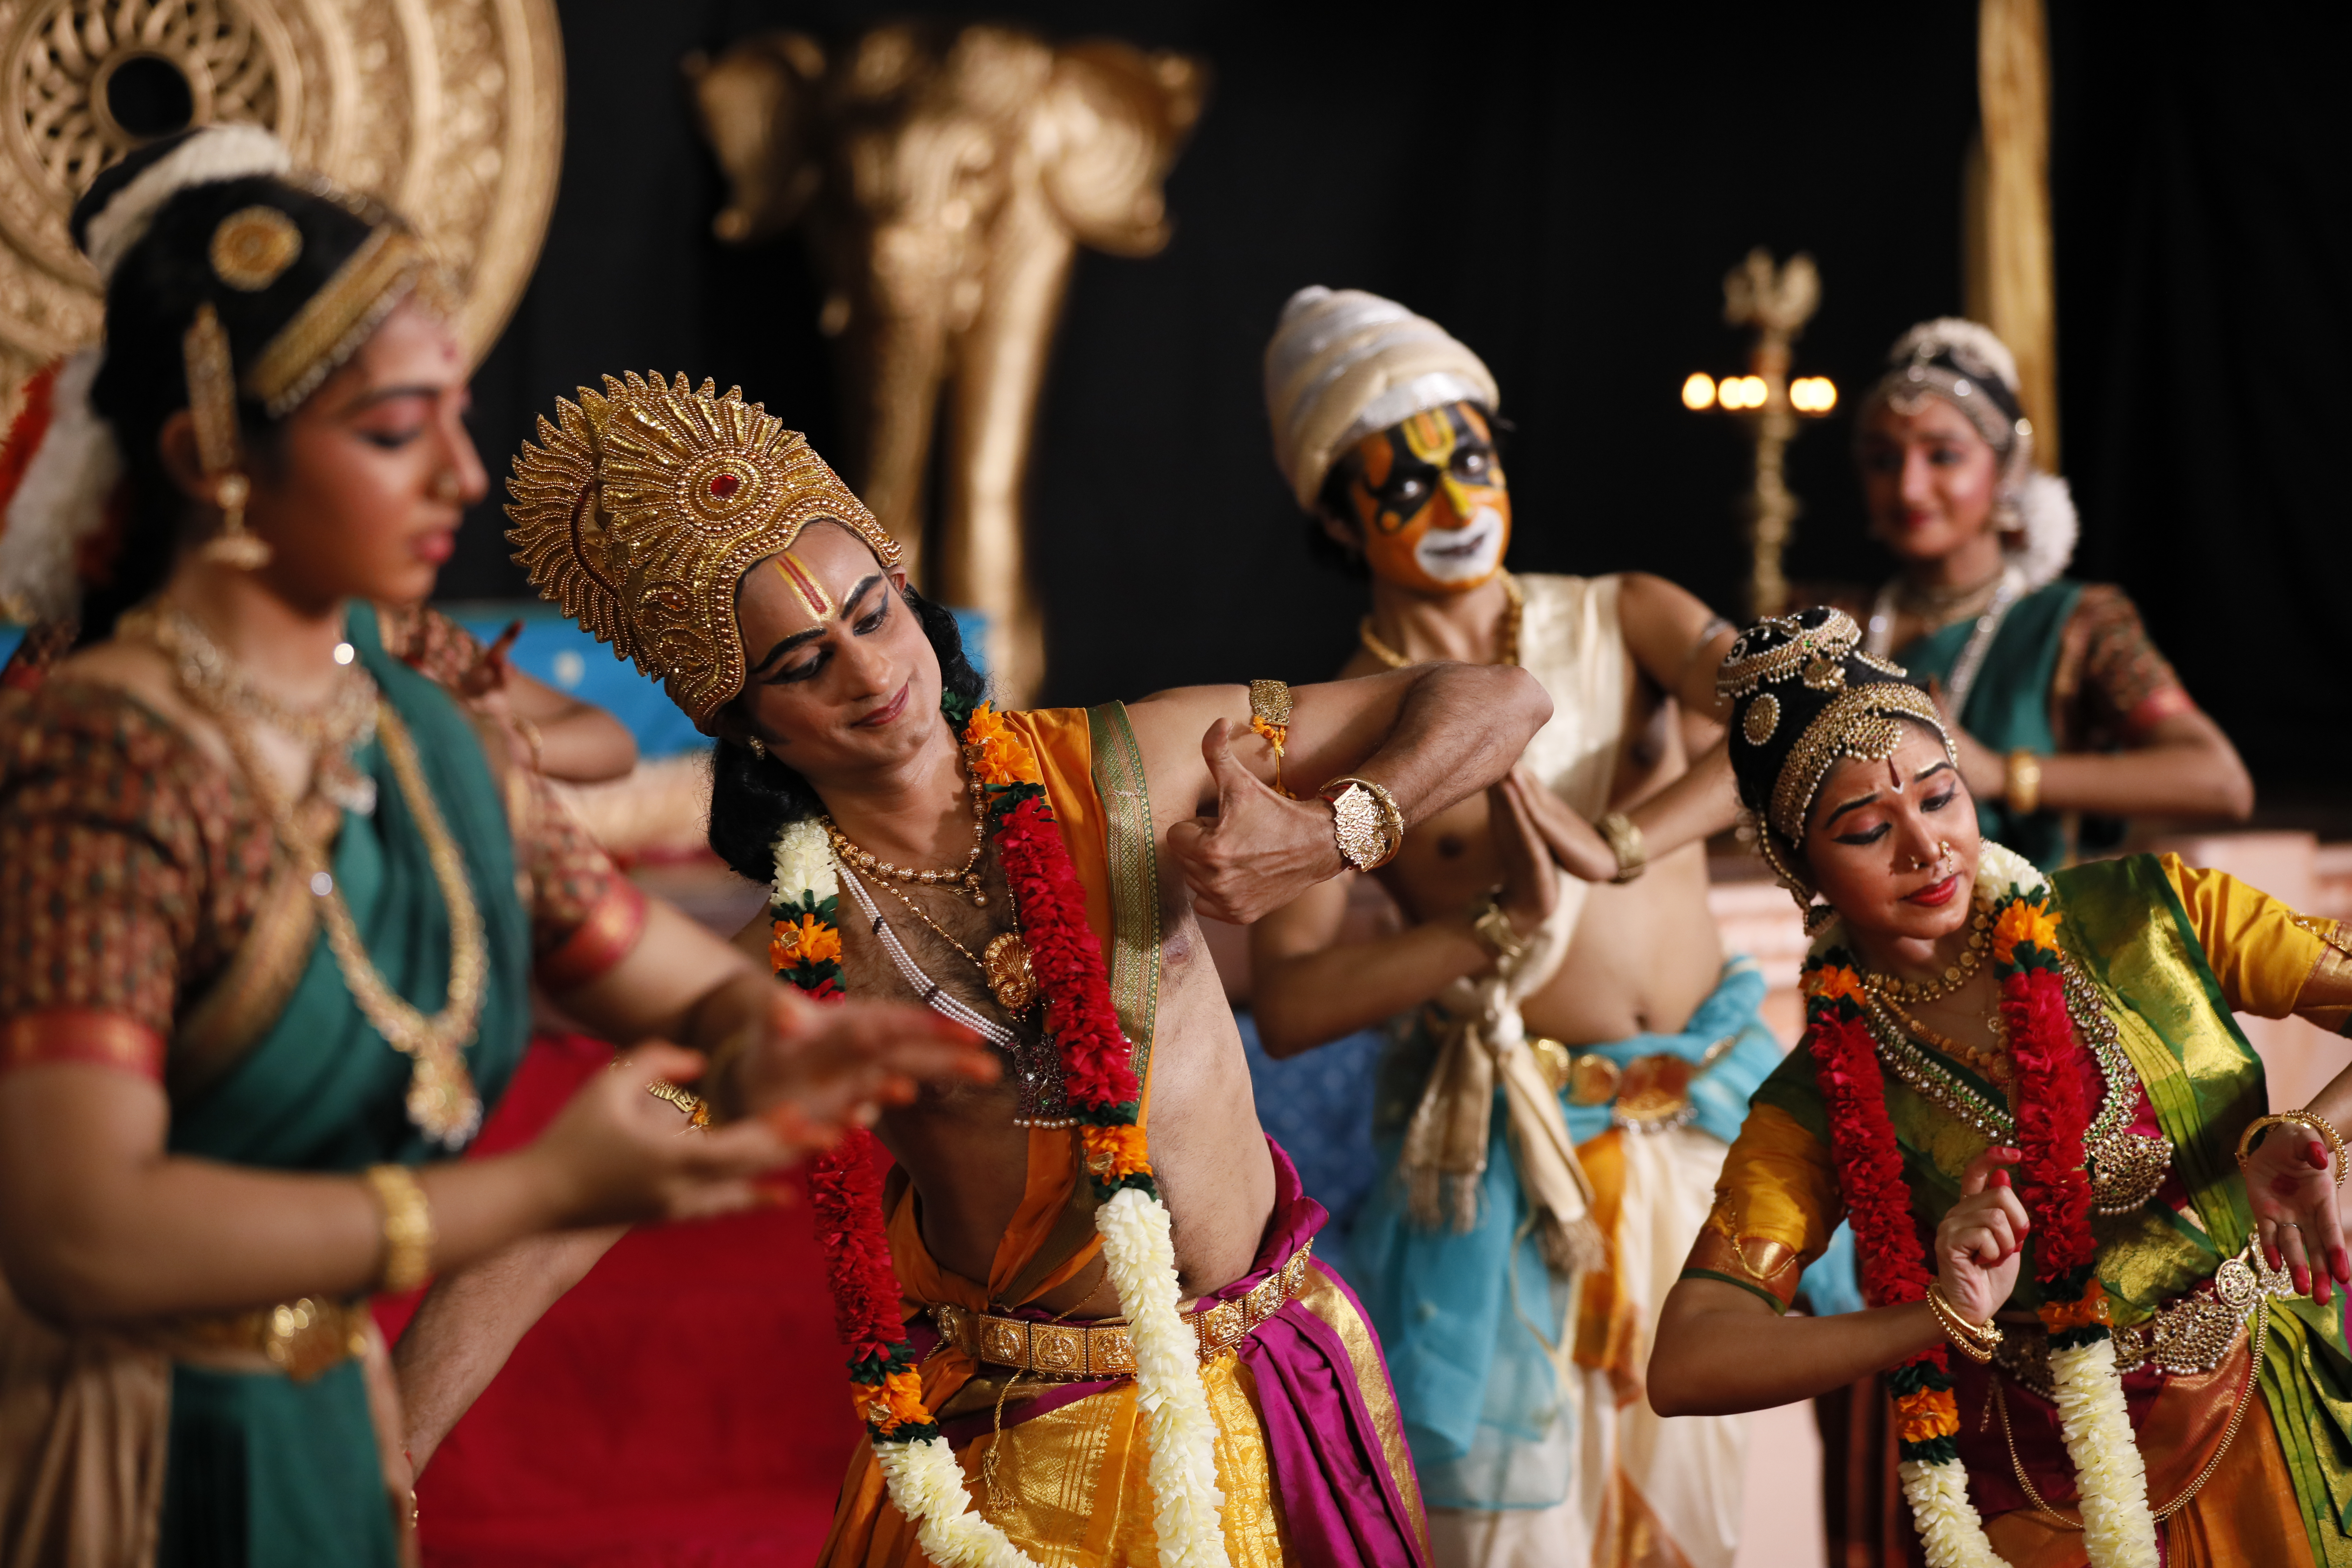 SIFAS Classical Dance on Rama's Coronation or Ramar Pattabhishekam. Photo Courtesy: IHC